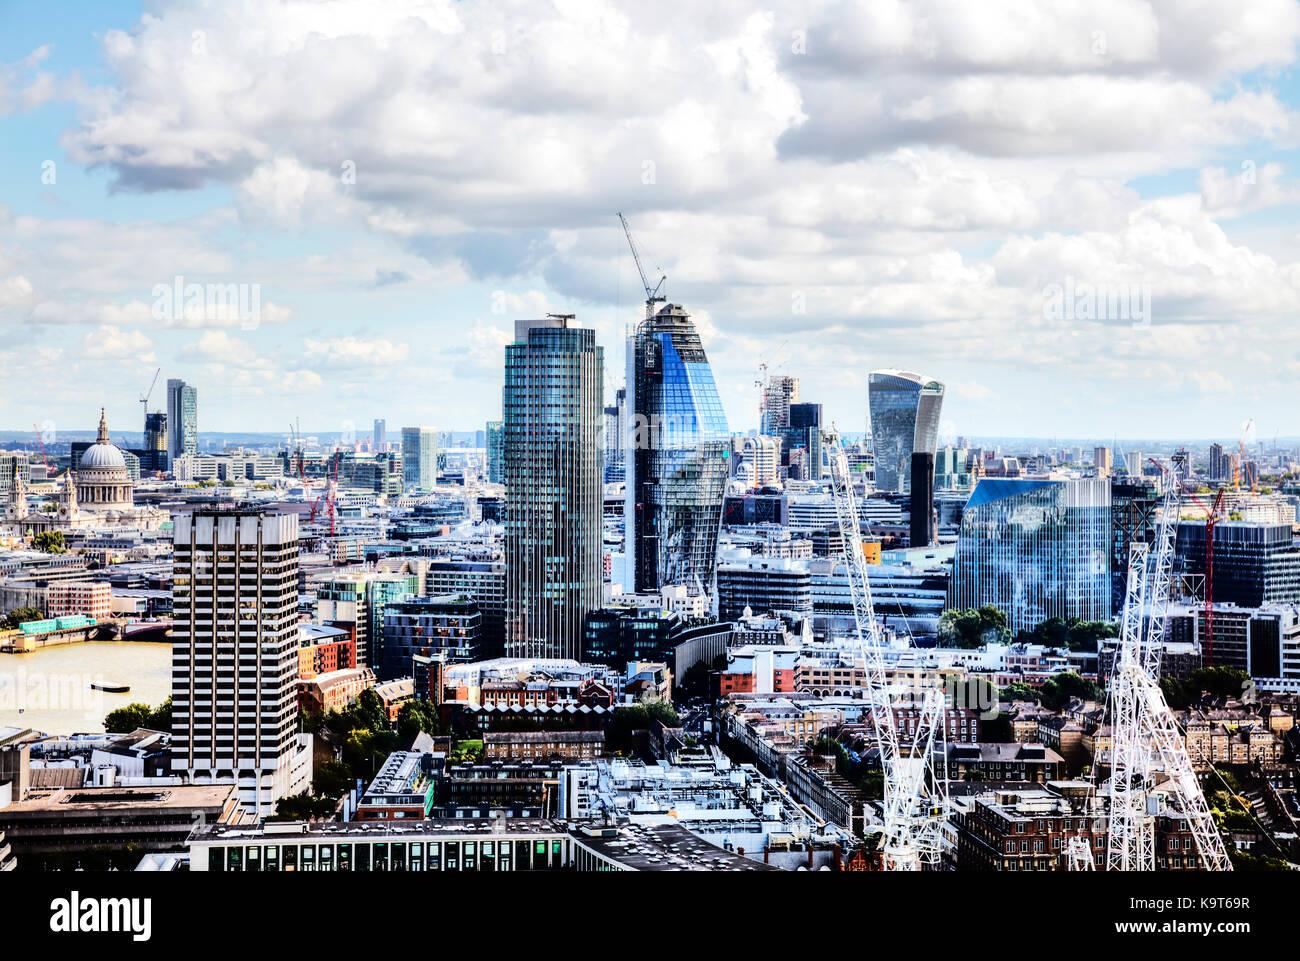 City of London square mile, Walkie-Talkie, NatWest Tower buildings, London construction, London buildings, London - Stock Image